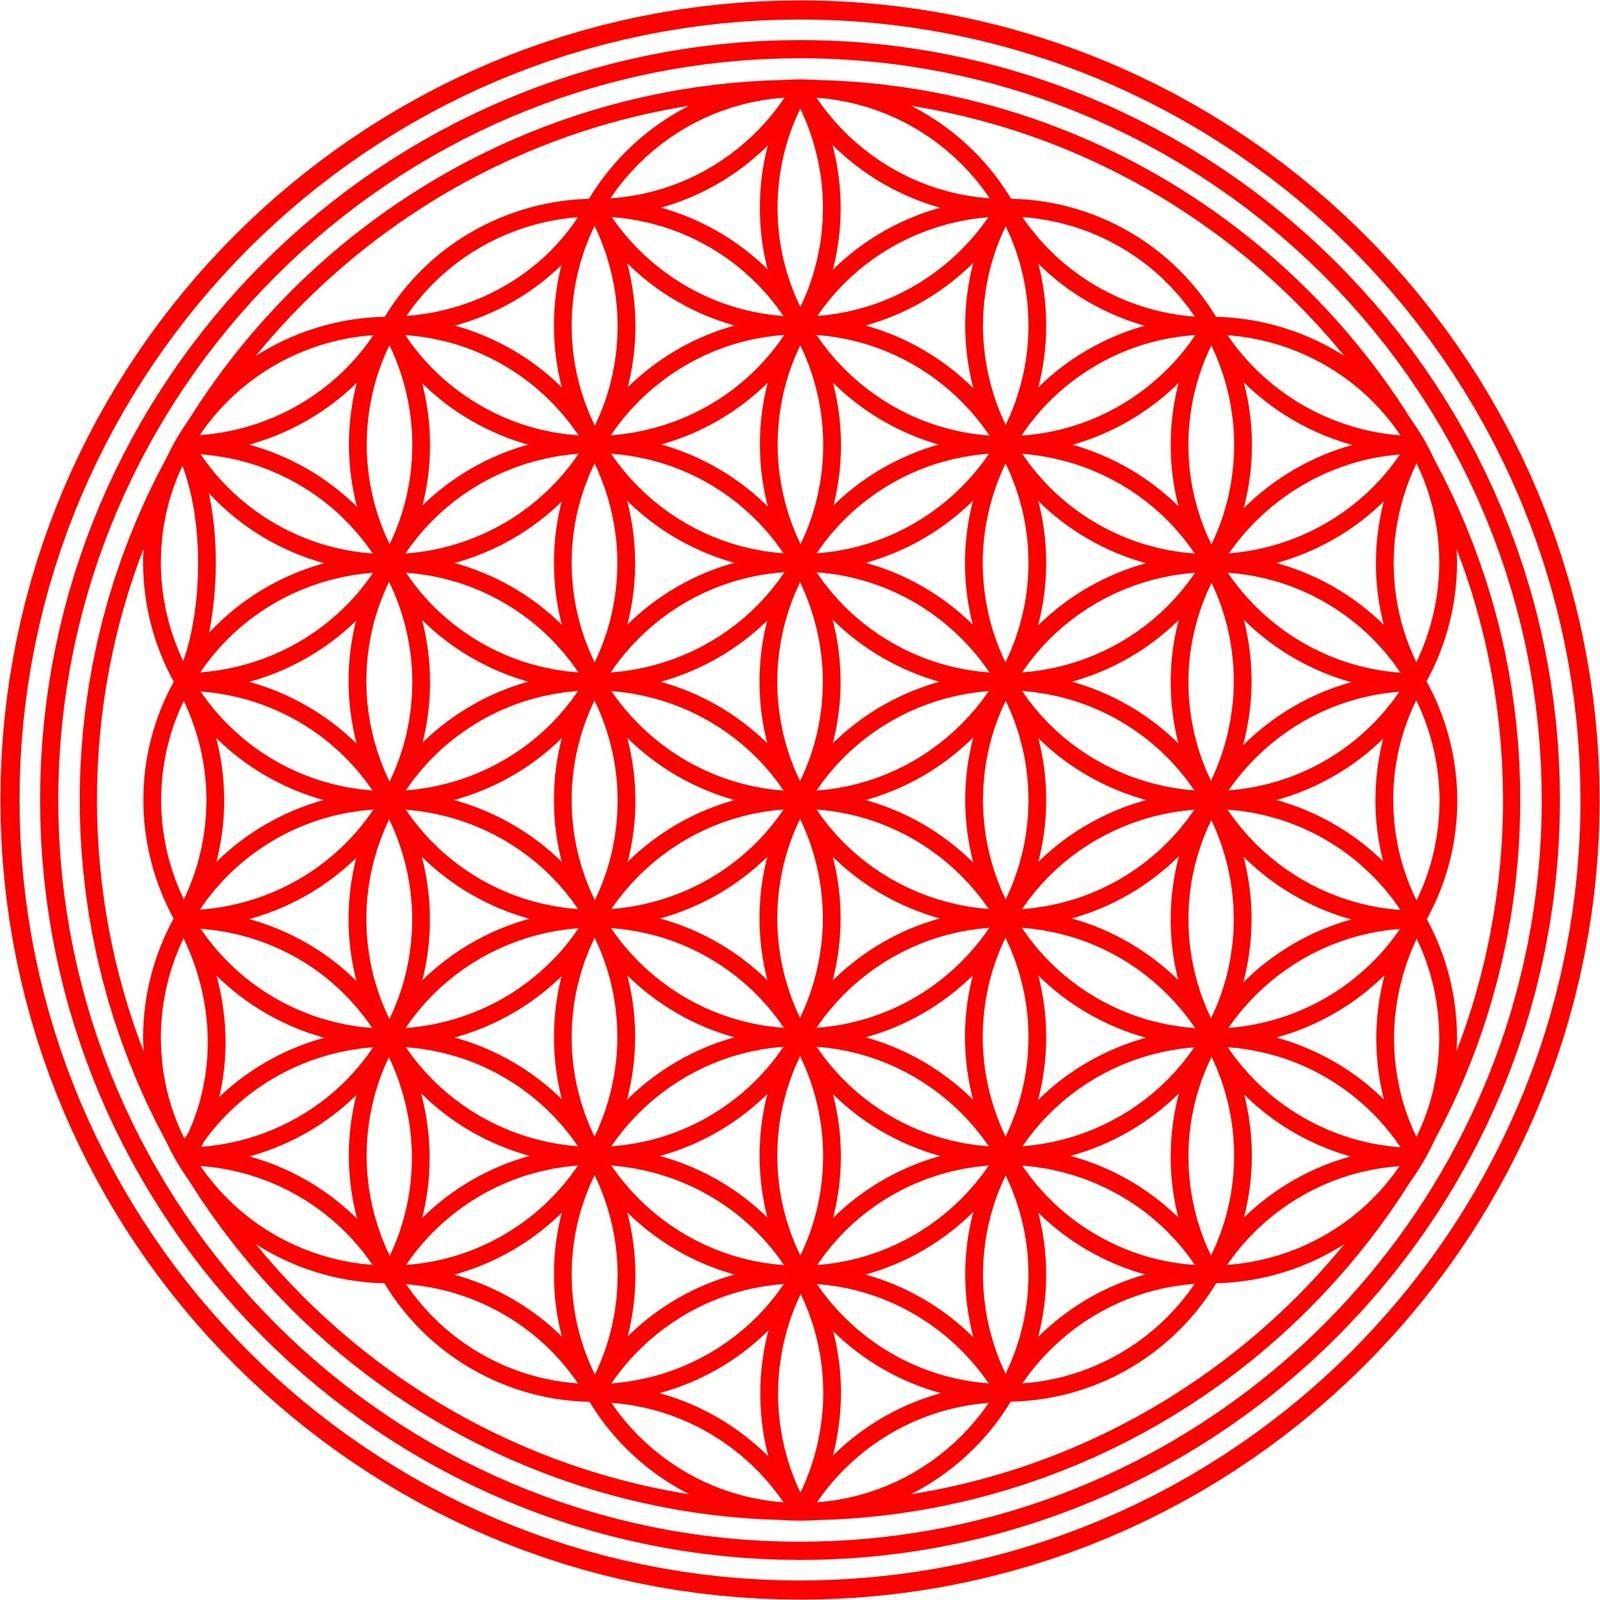 Simple Details zu Wandtattoo Aufkleber Blume des Lebens Mandala Heilige Geometrie Feng Shui